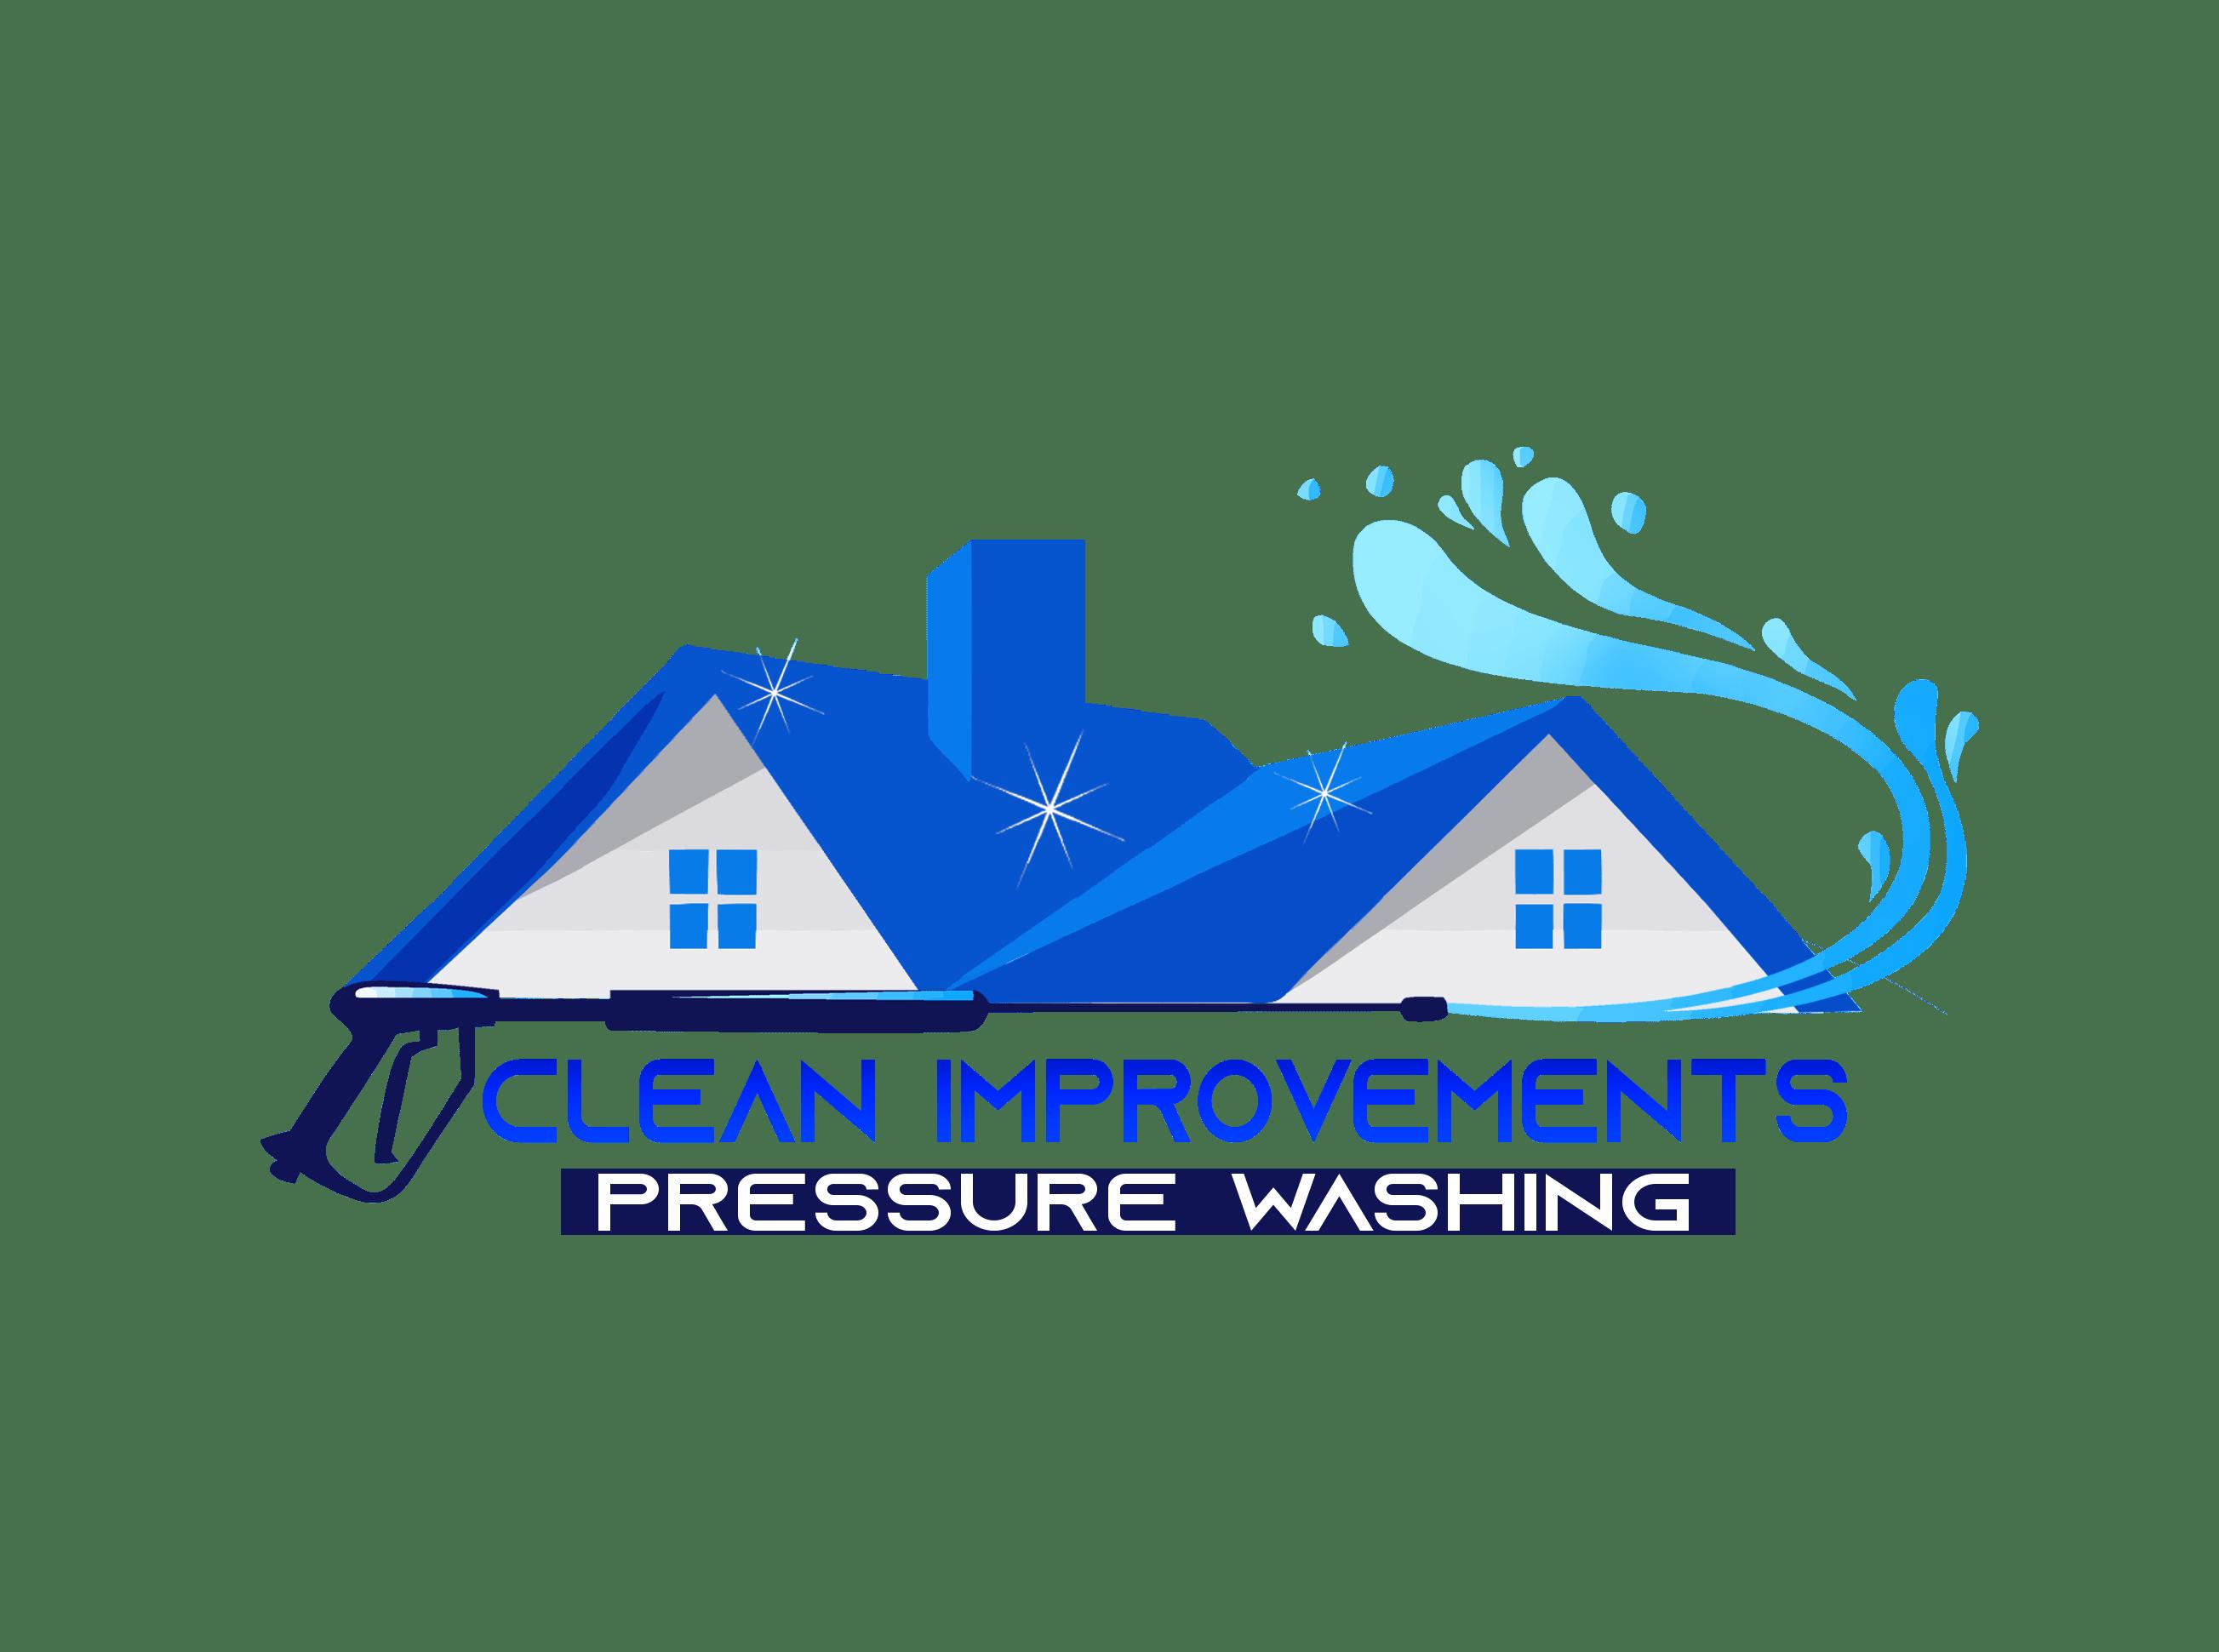 Clean Improvements Pressure Washing